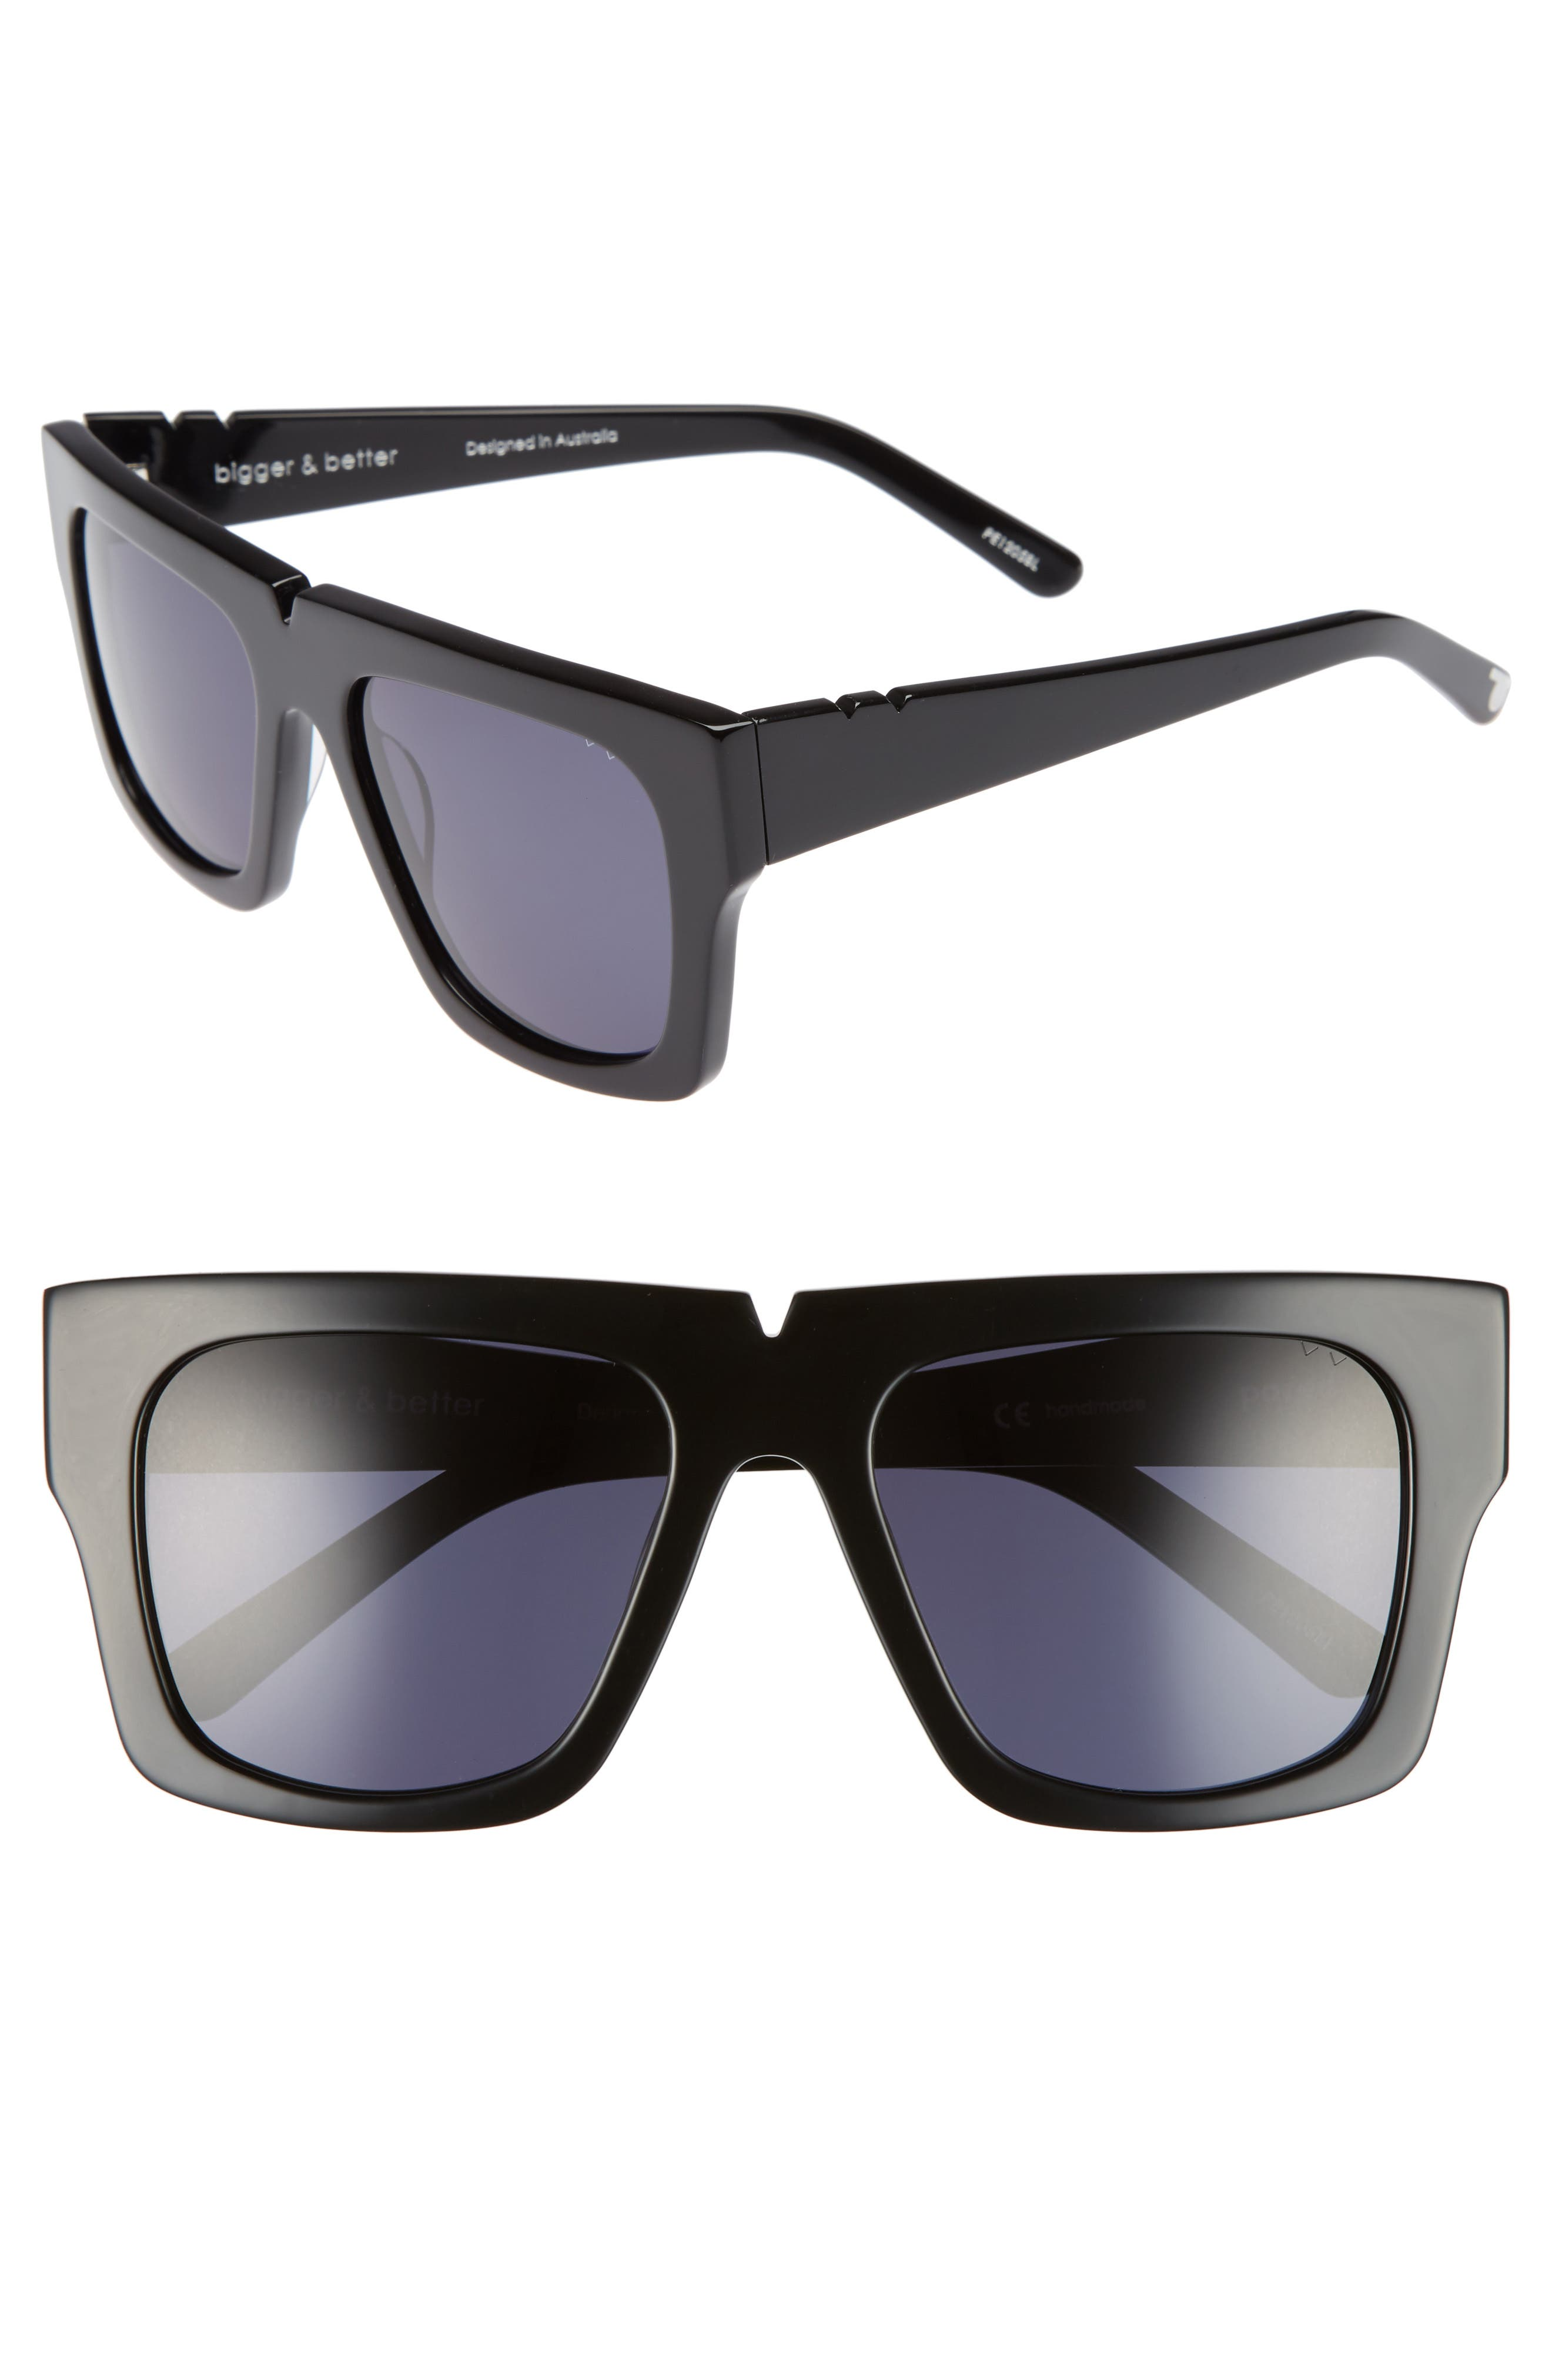 Main Image - Pared Bigger & Better 54mm Sunglasses